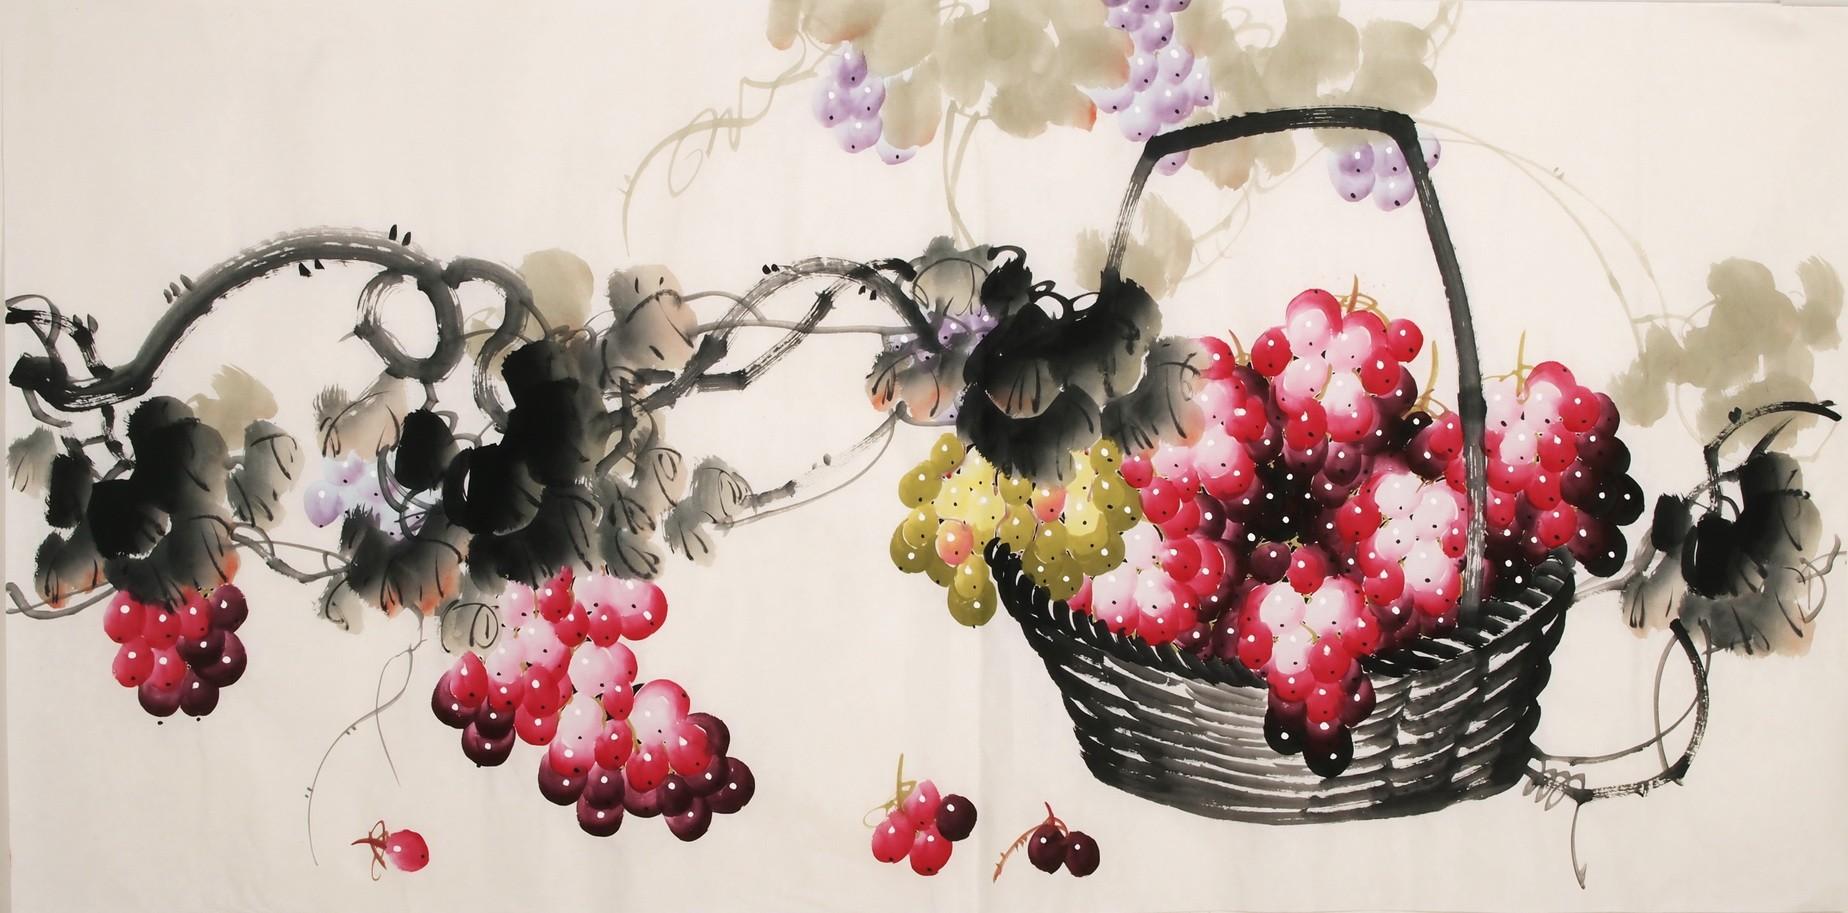 Grapes - CNAG003289